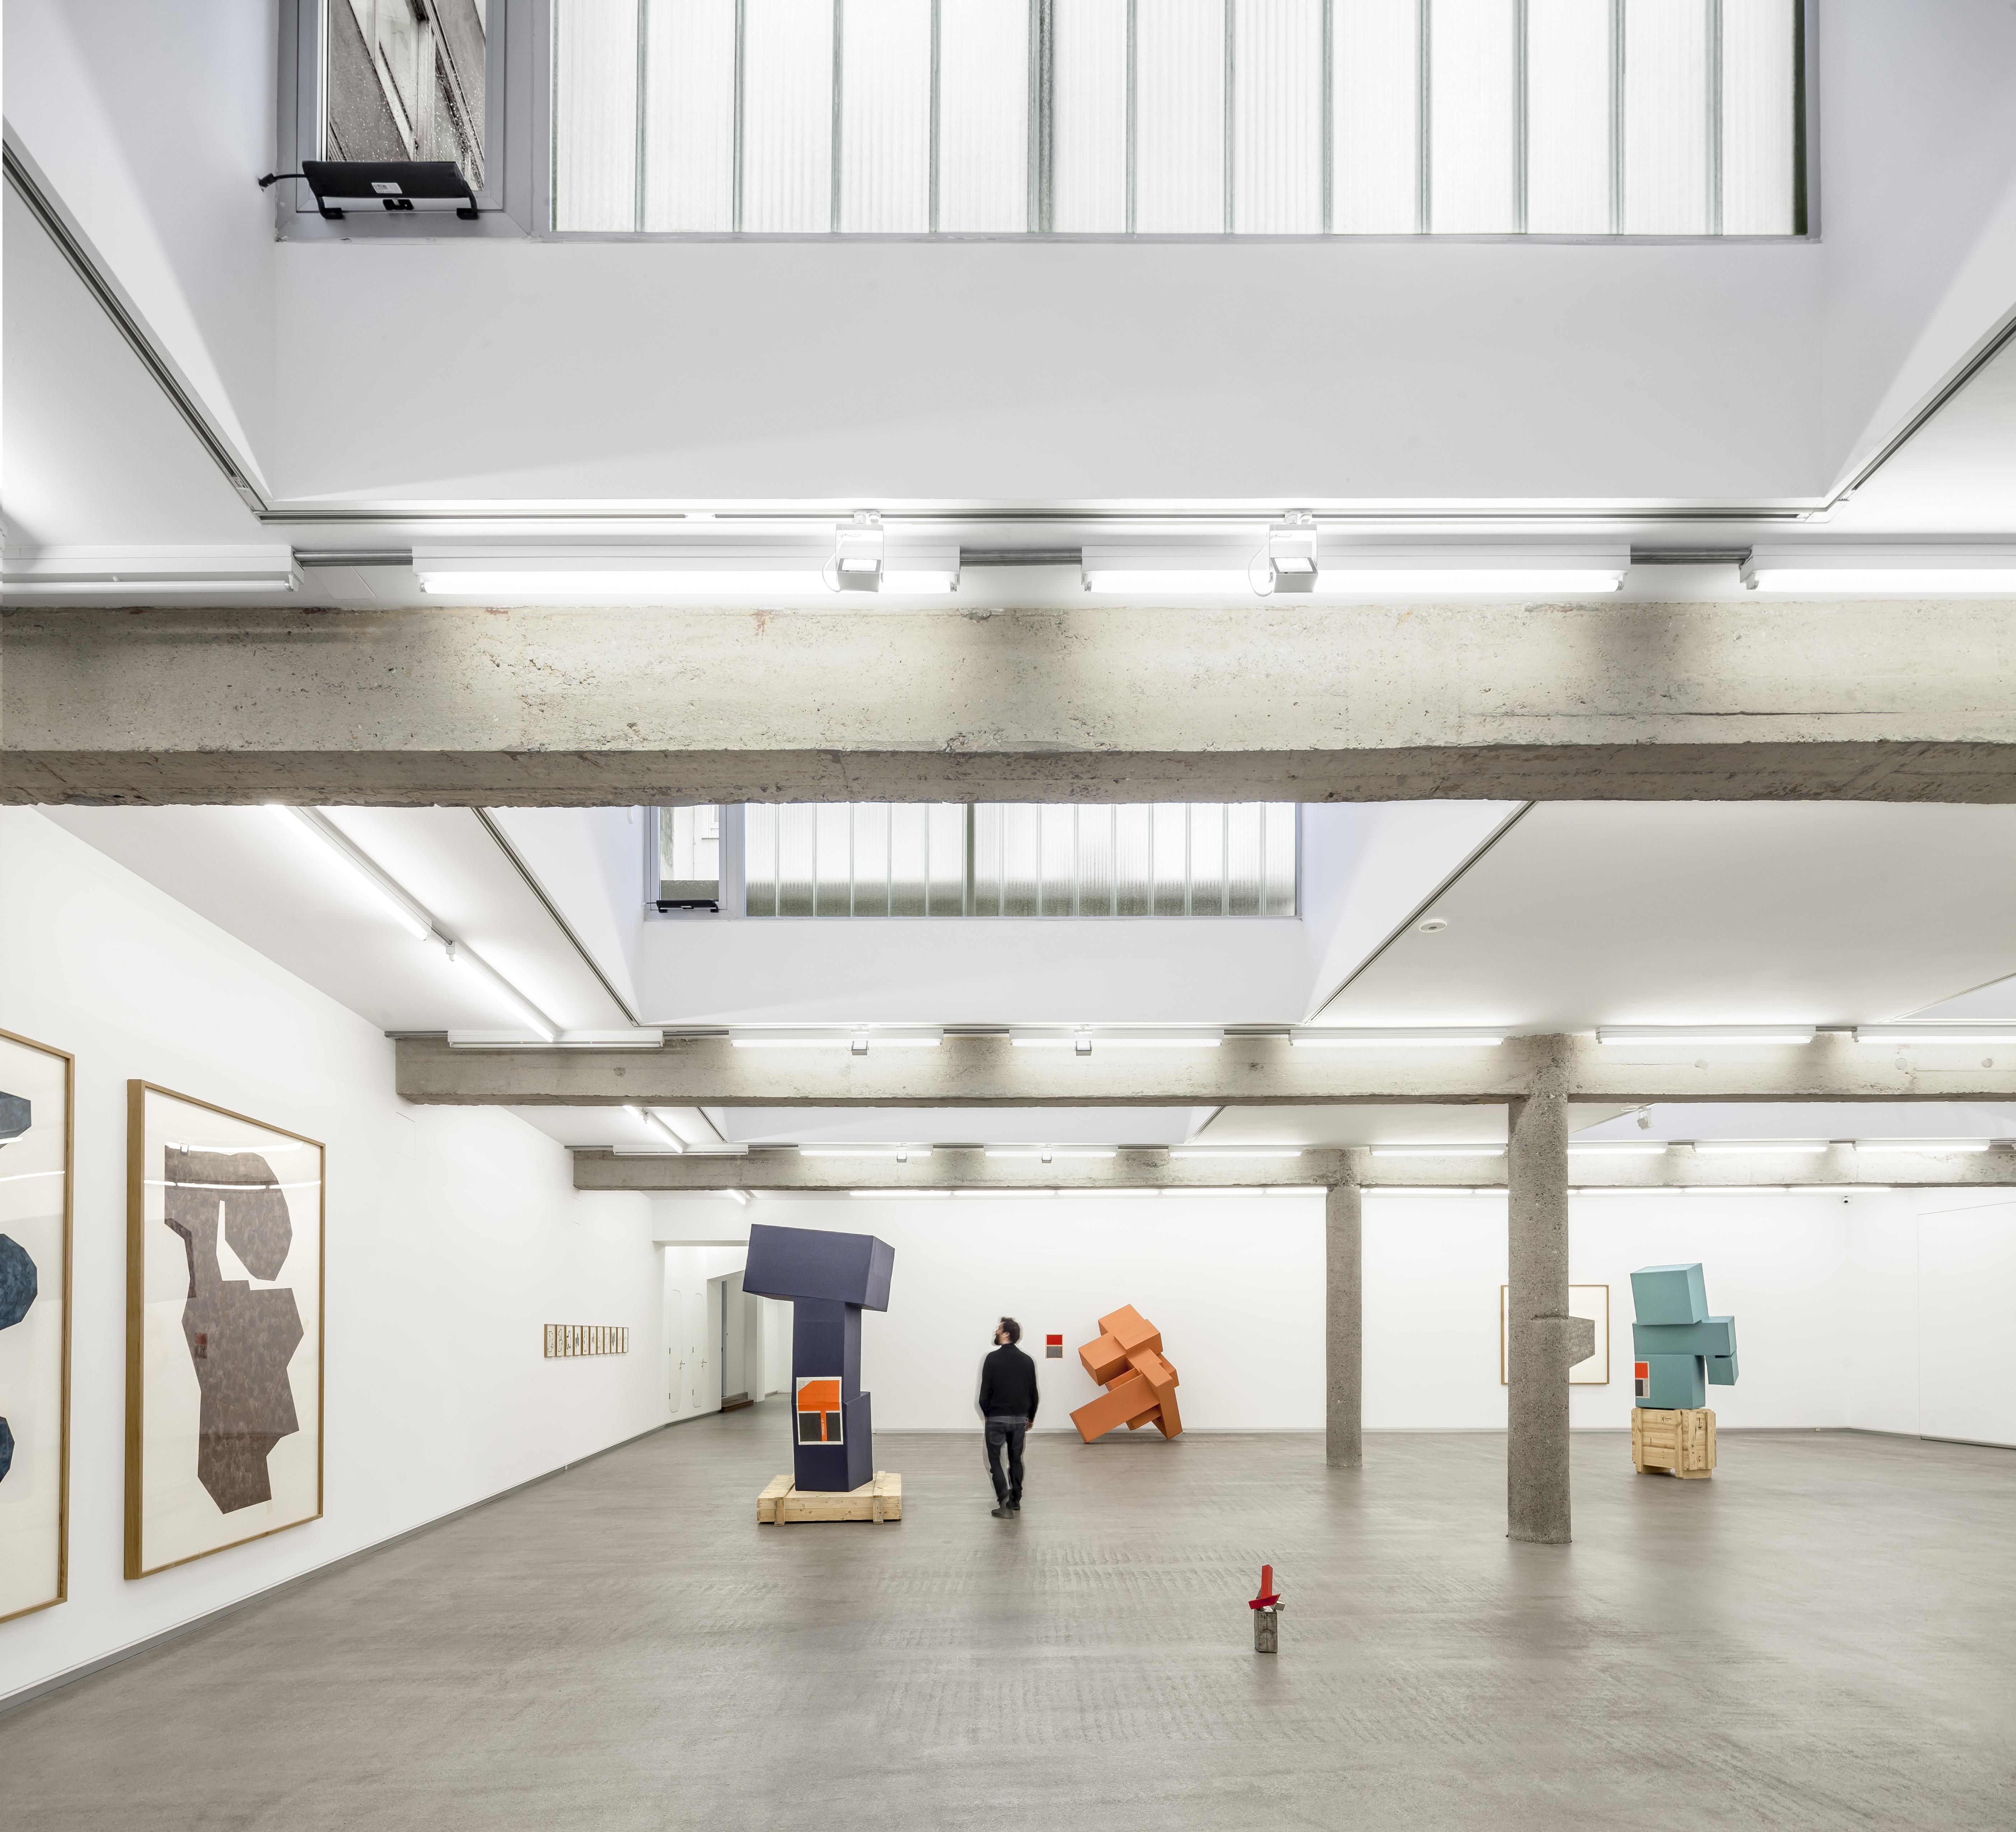 Arquitectura reinventada la respuesta de los arquitectos - Estudio arquitectura bilbao ...